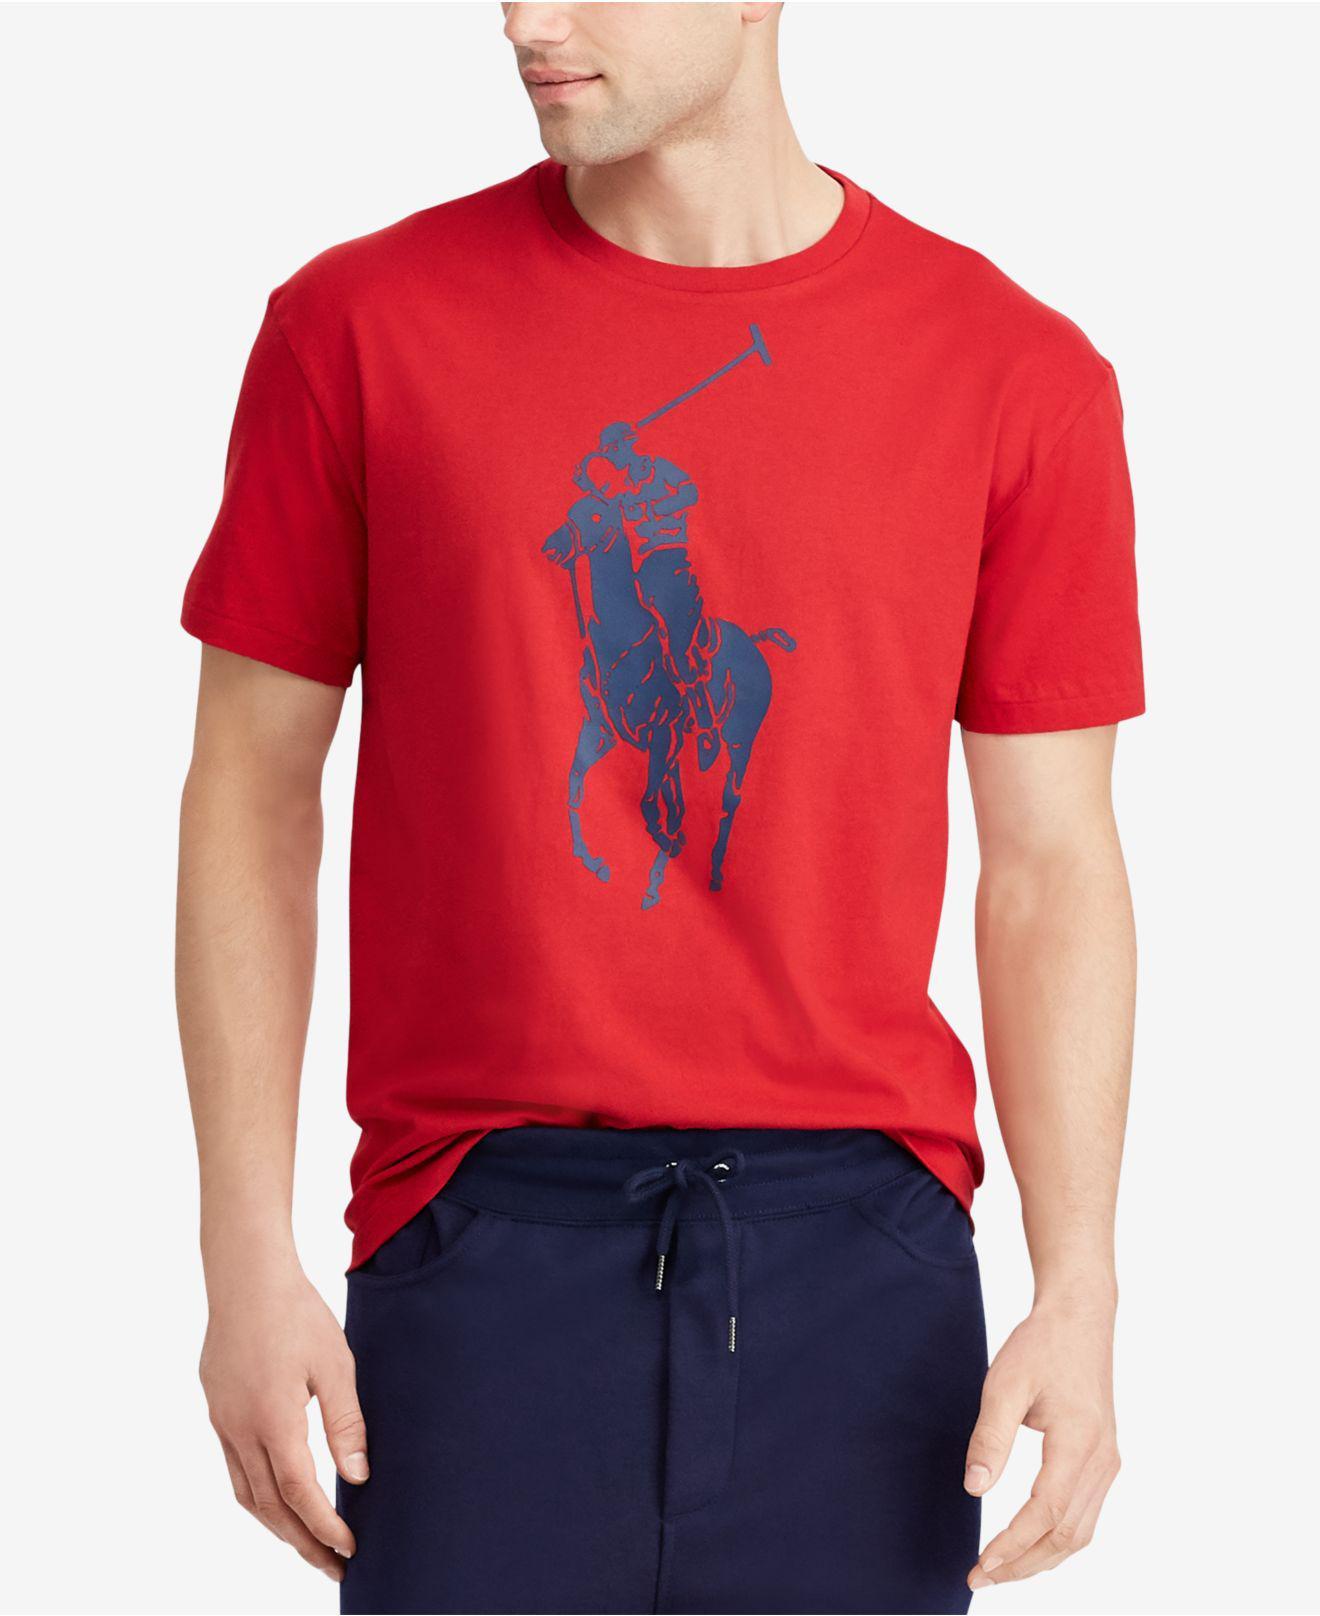 Classic-fit Big Pony T-shirt